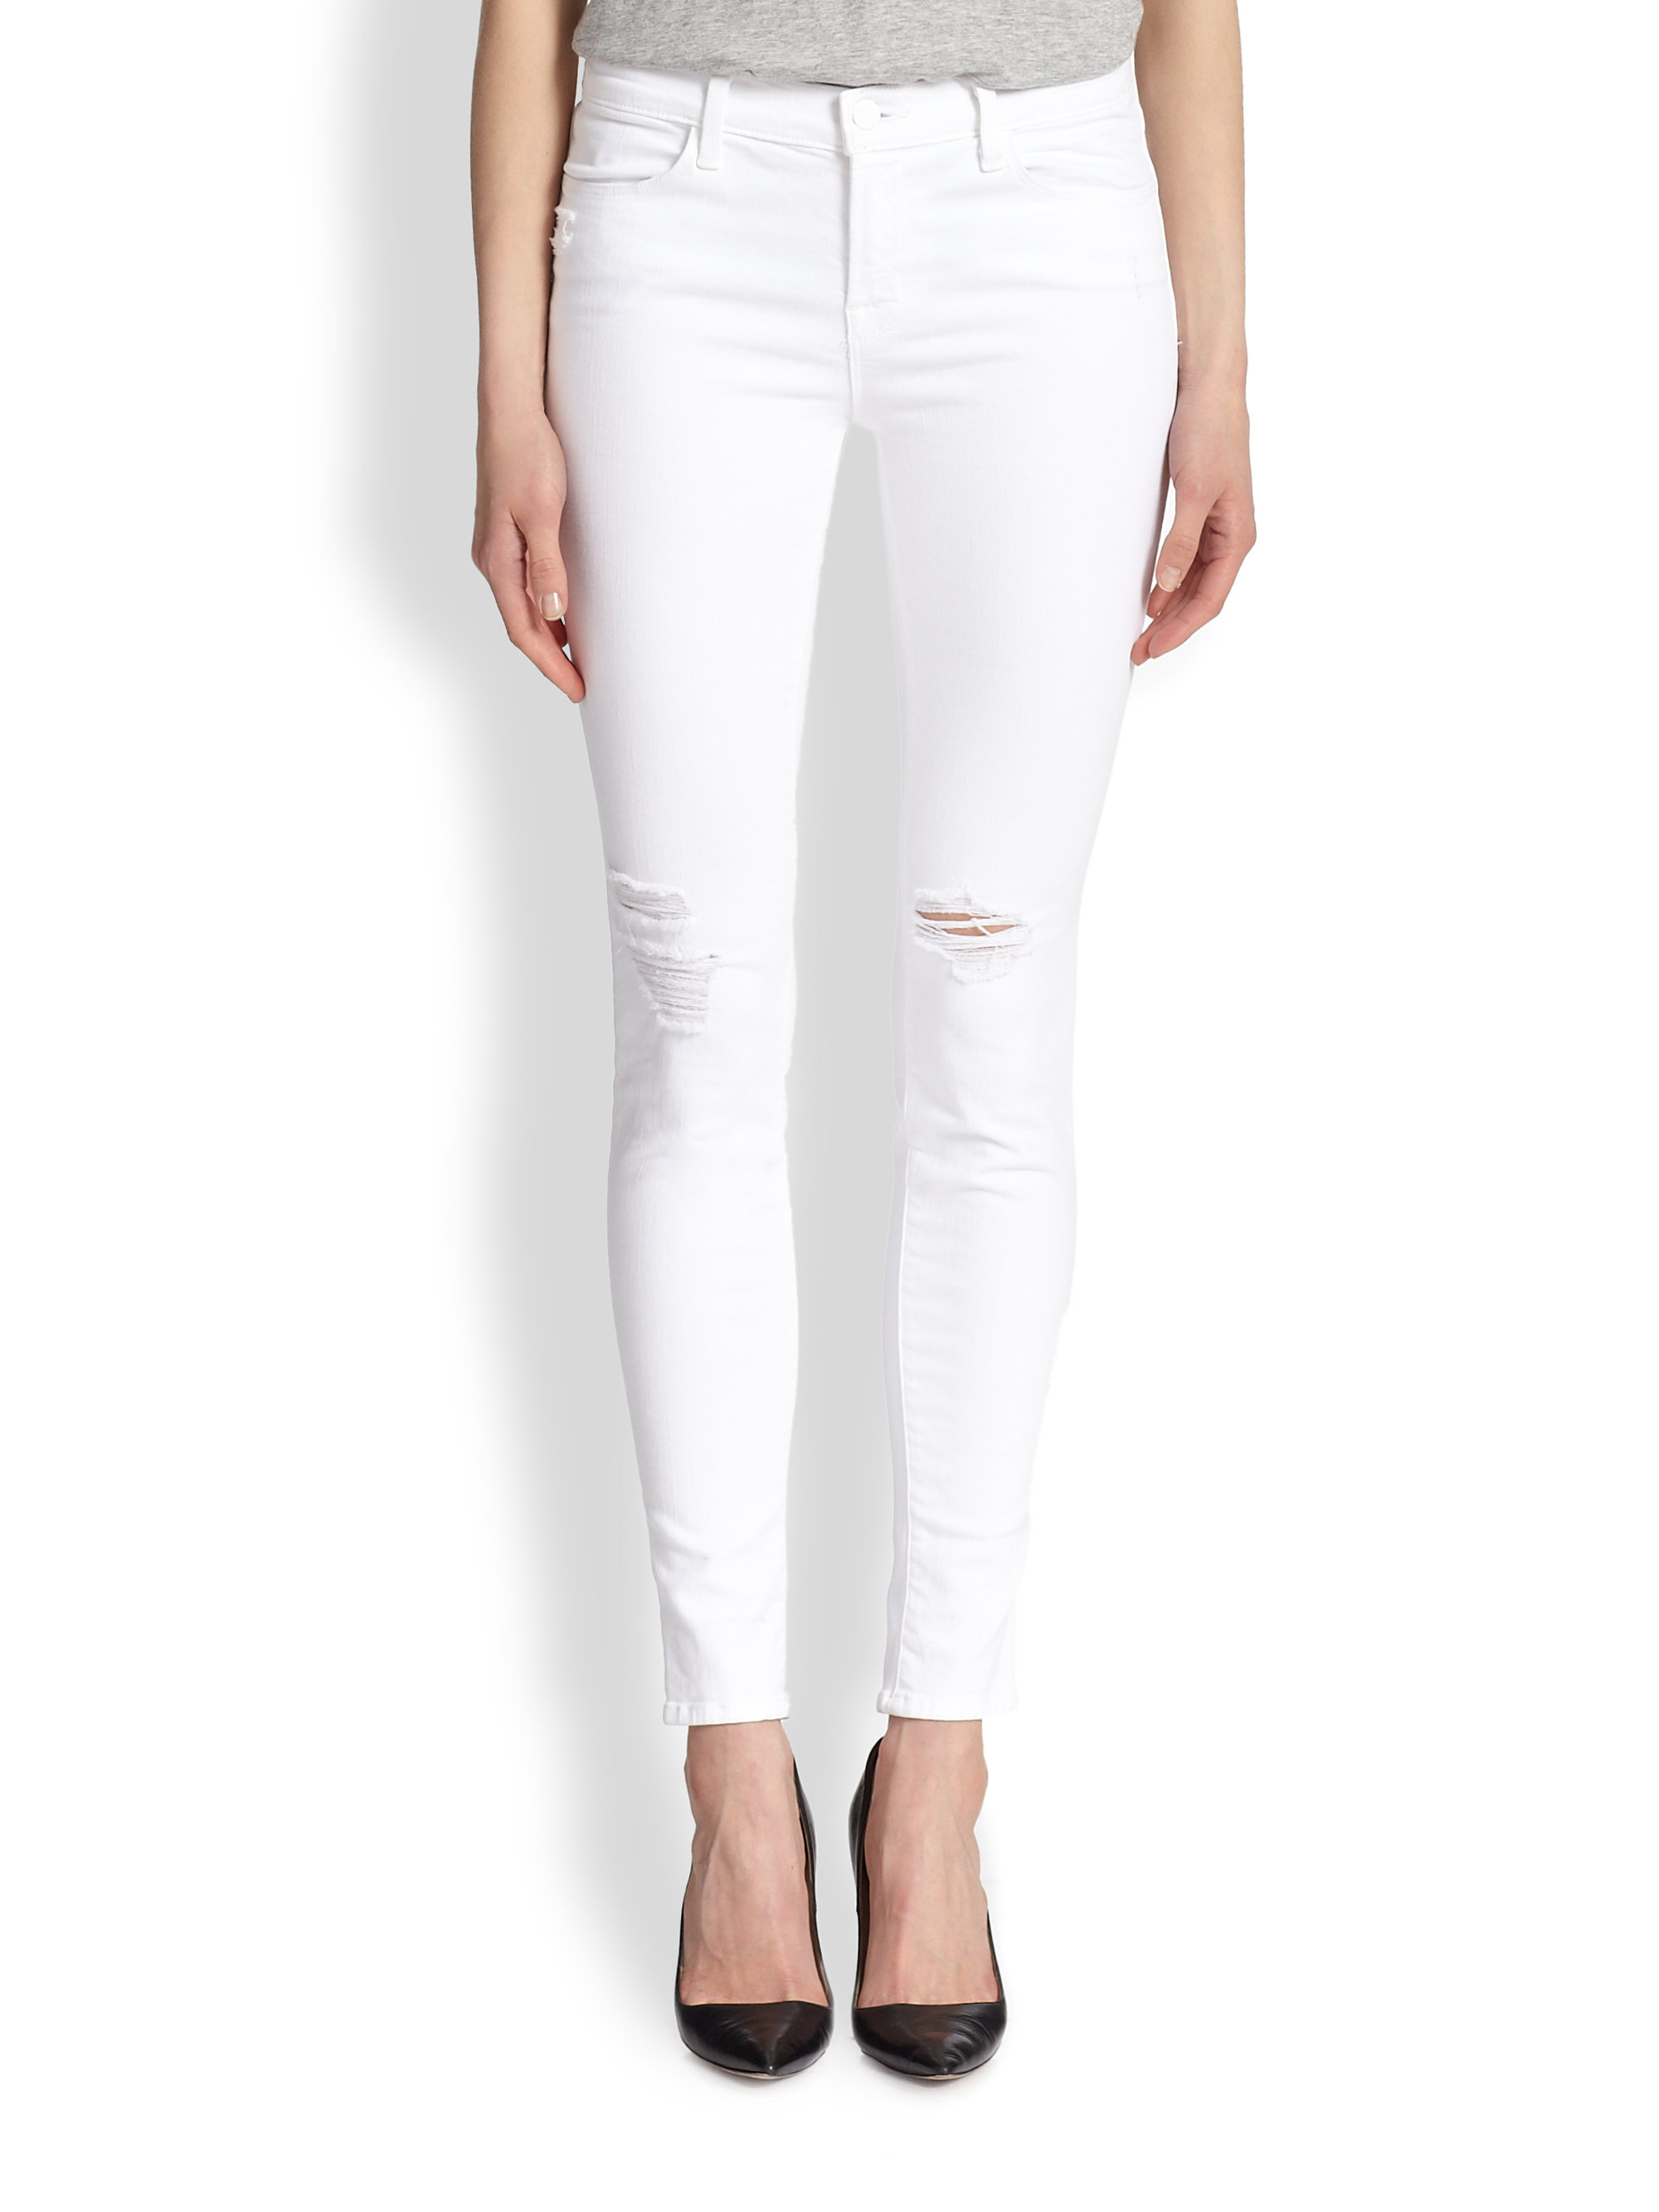 J brand White Rock Destructed Skinny Jeans in White | Lyst